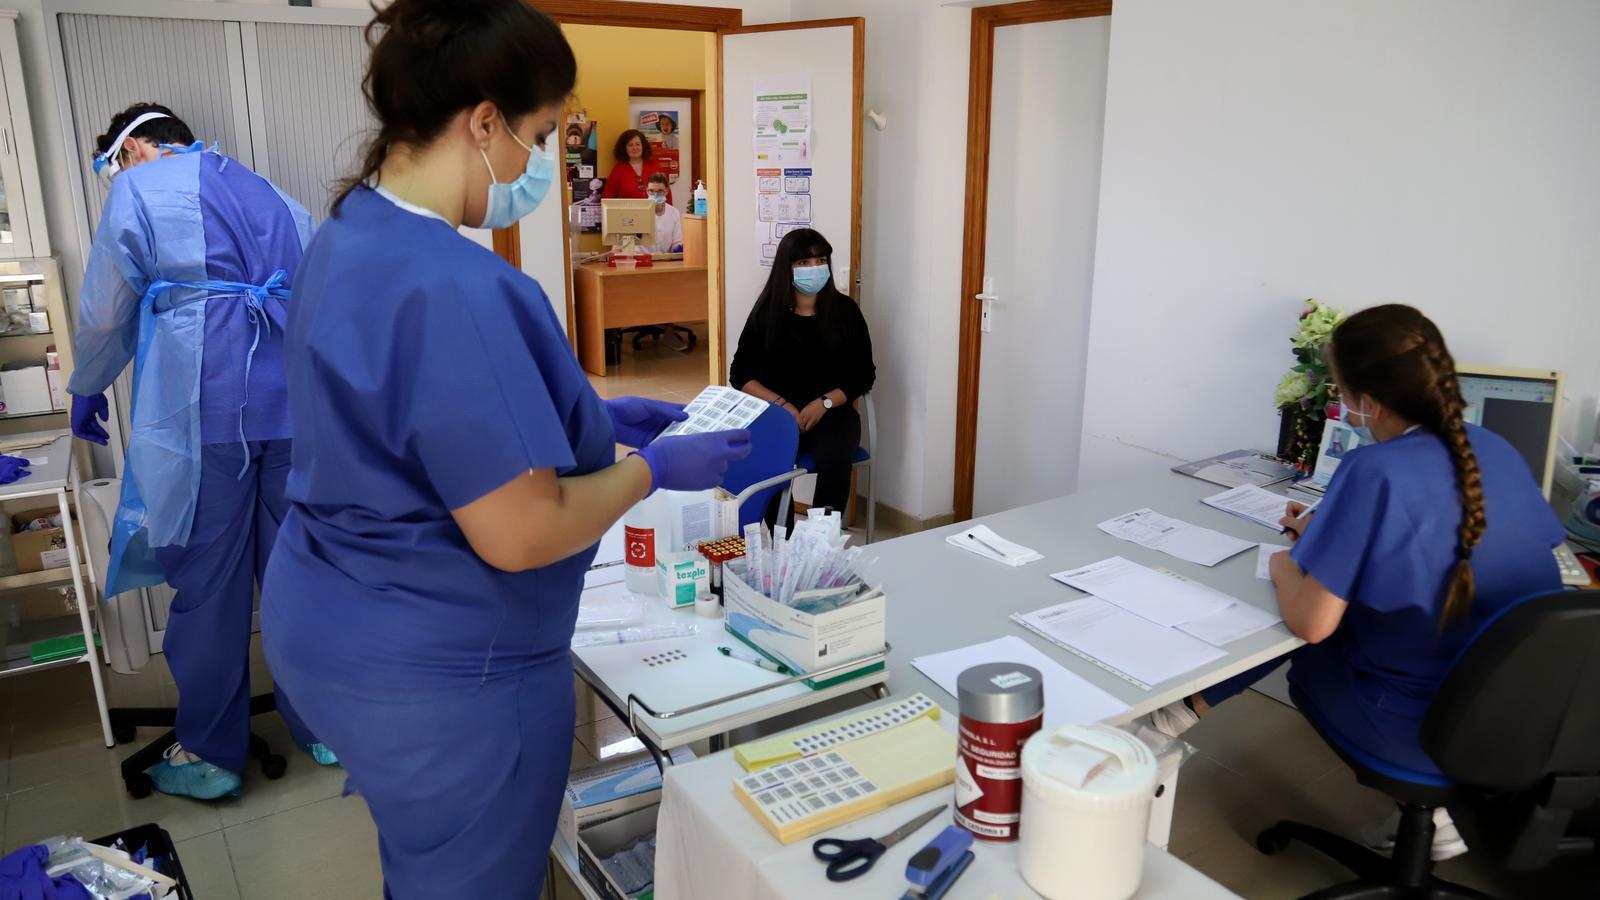 Realitzant proves de coronavirus a un centre de salut